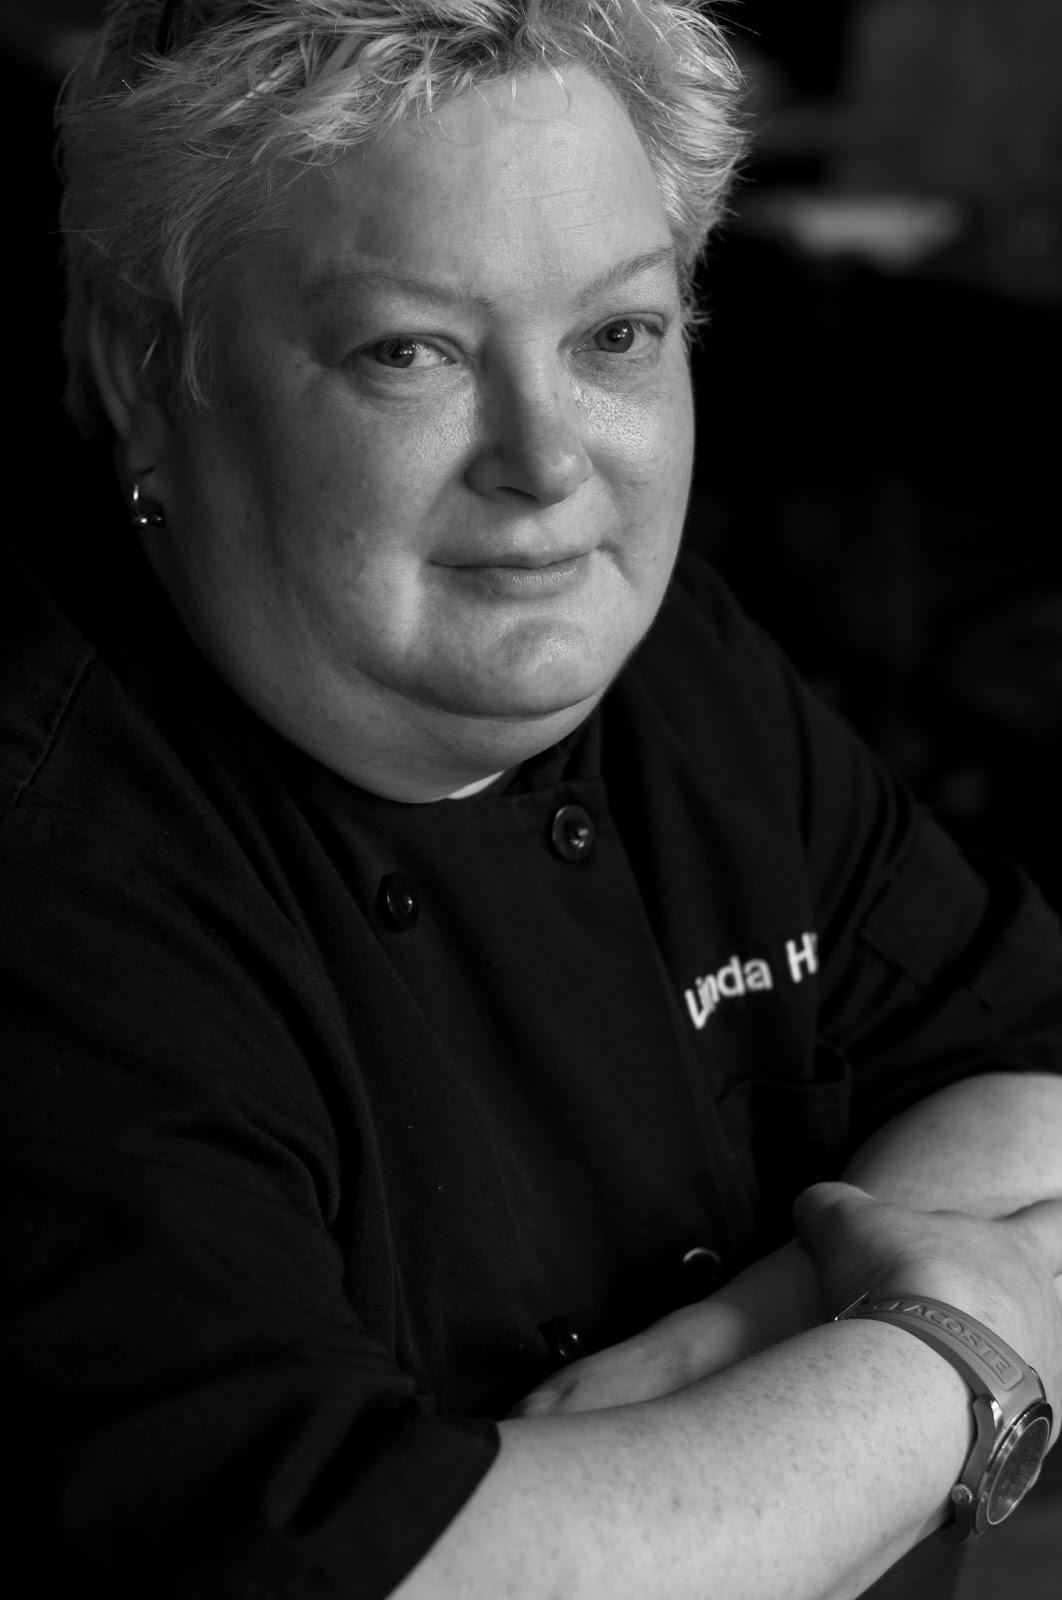 Cristy lee chef linda harrell brings more